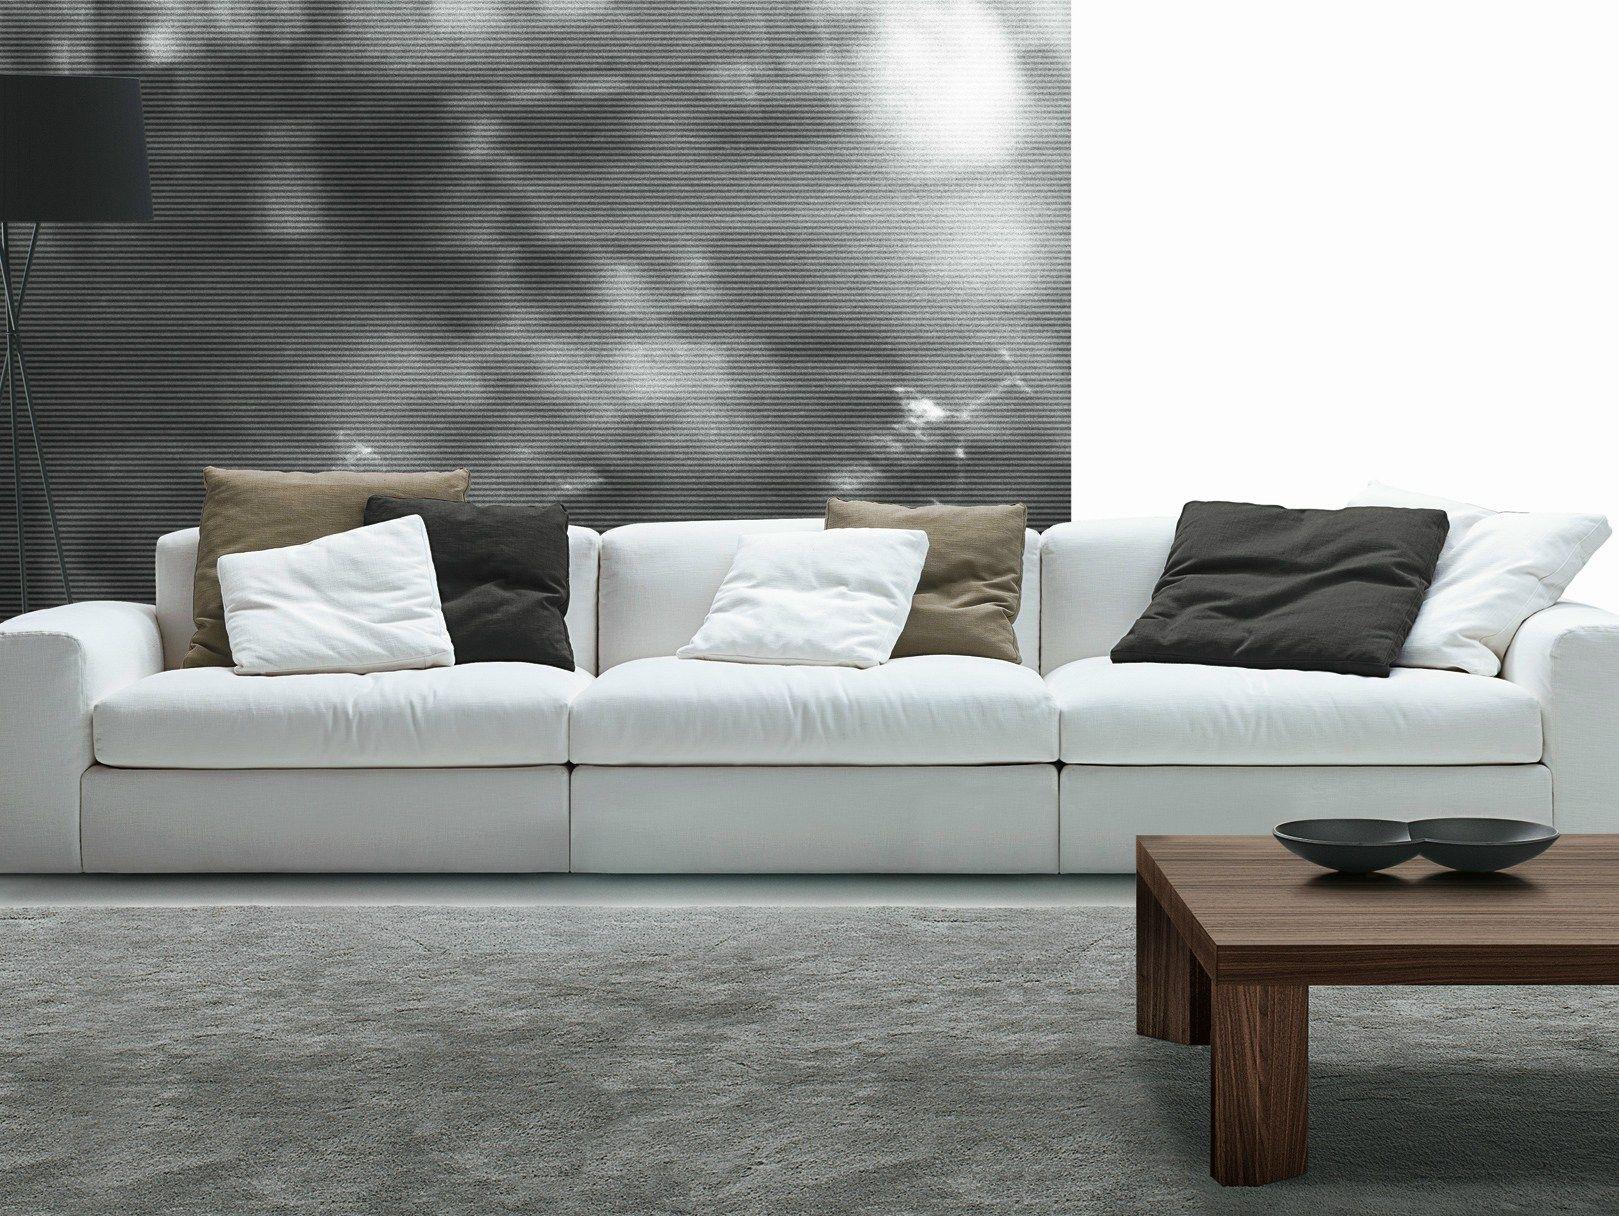 Full Size of Sofa Abnehmbarer Bezug Modulares Mit Abnehmbarem Sofas Ikea Abnehmbaren Grau Abnehmbar Waschbar Hussen Big Waschbarer Aus Stoff Dune Kollektion By München Sofa Sofa Abnehmbarer Bezug